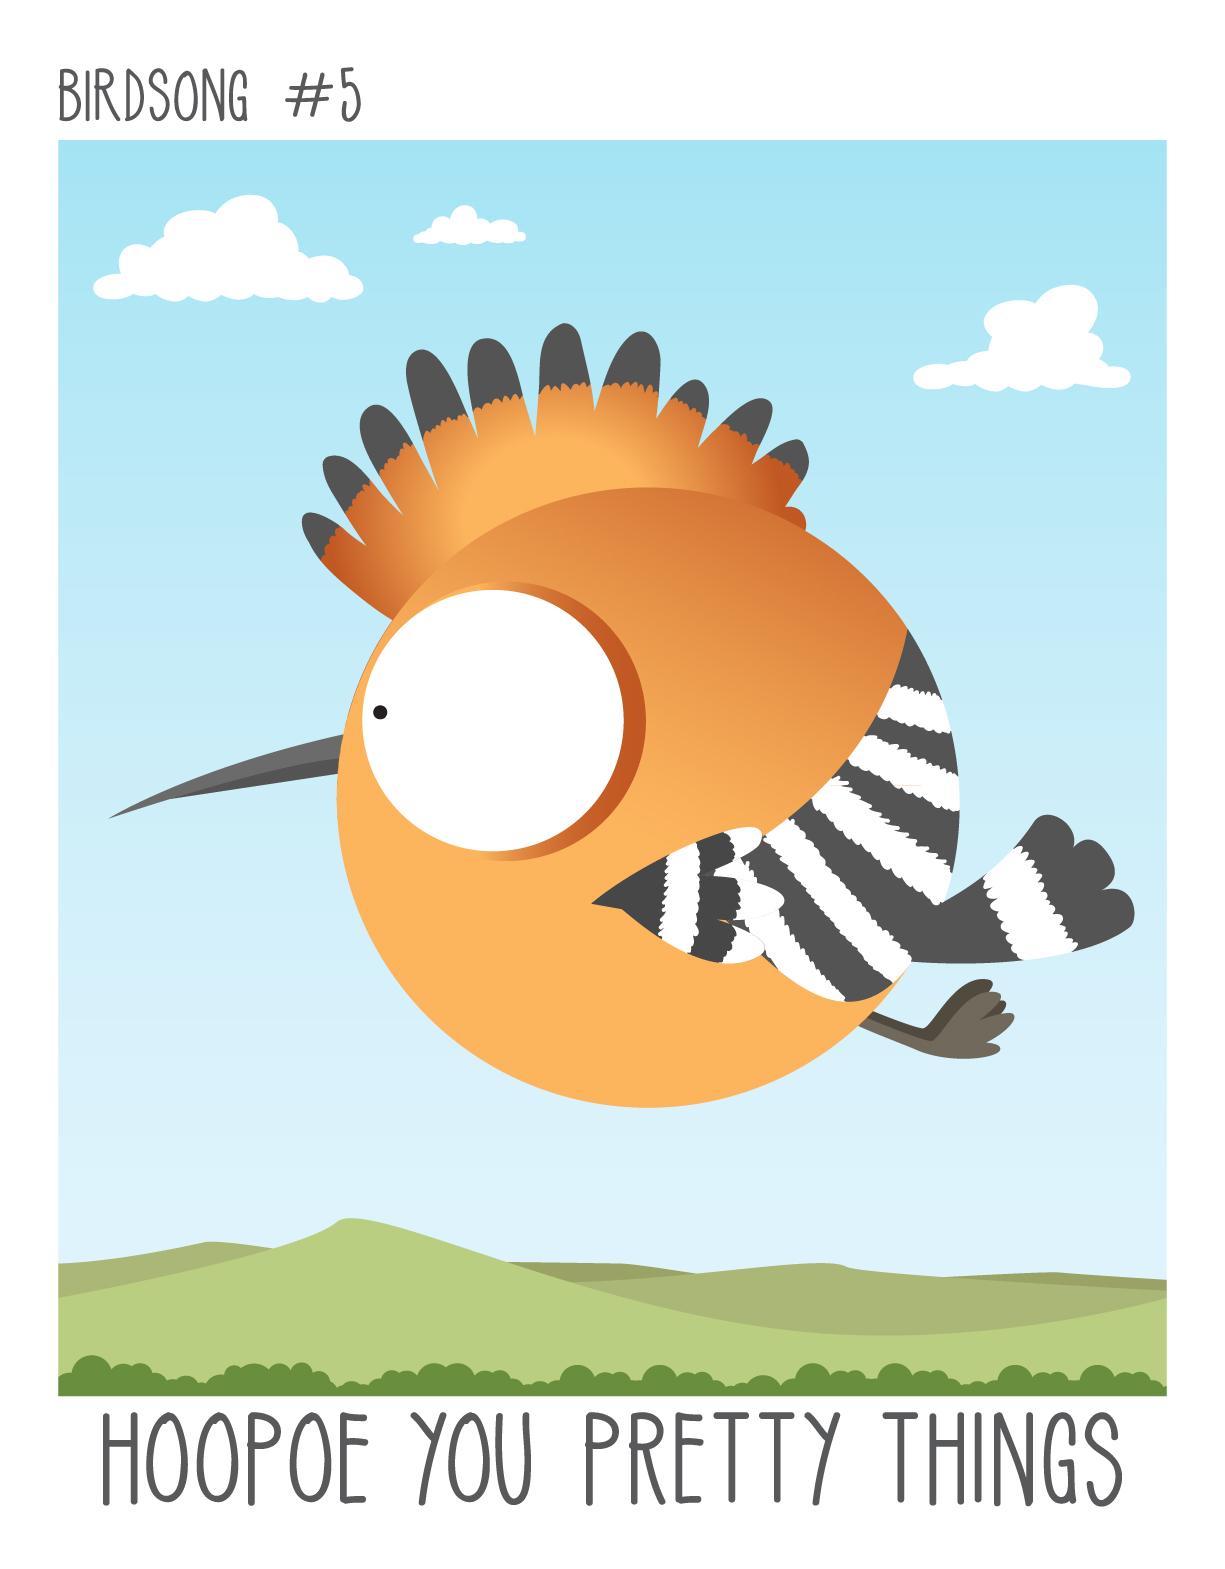 Bird song #5 Hoopoe.jpg